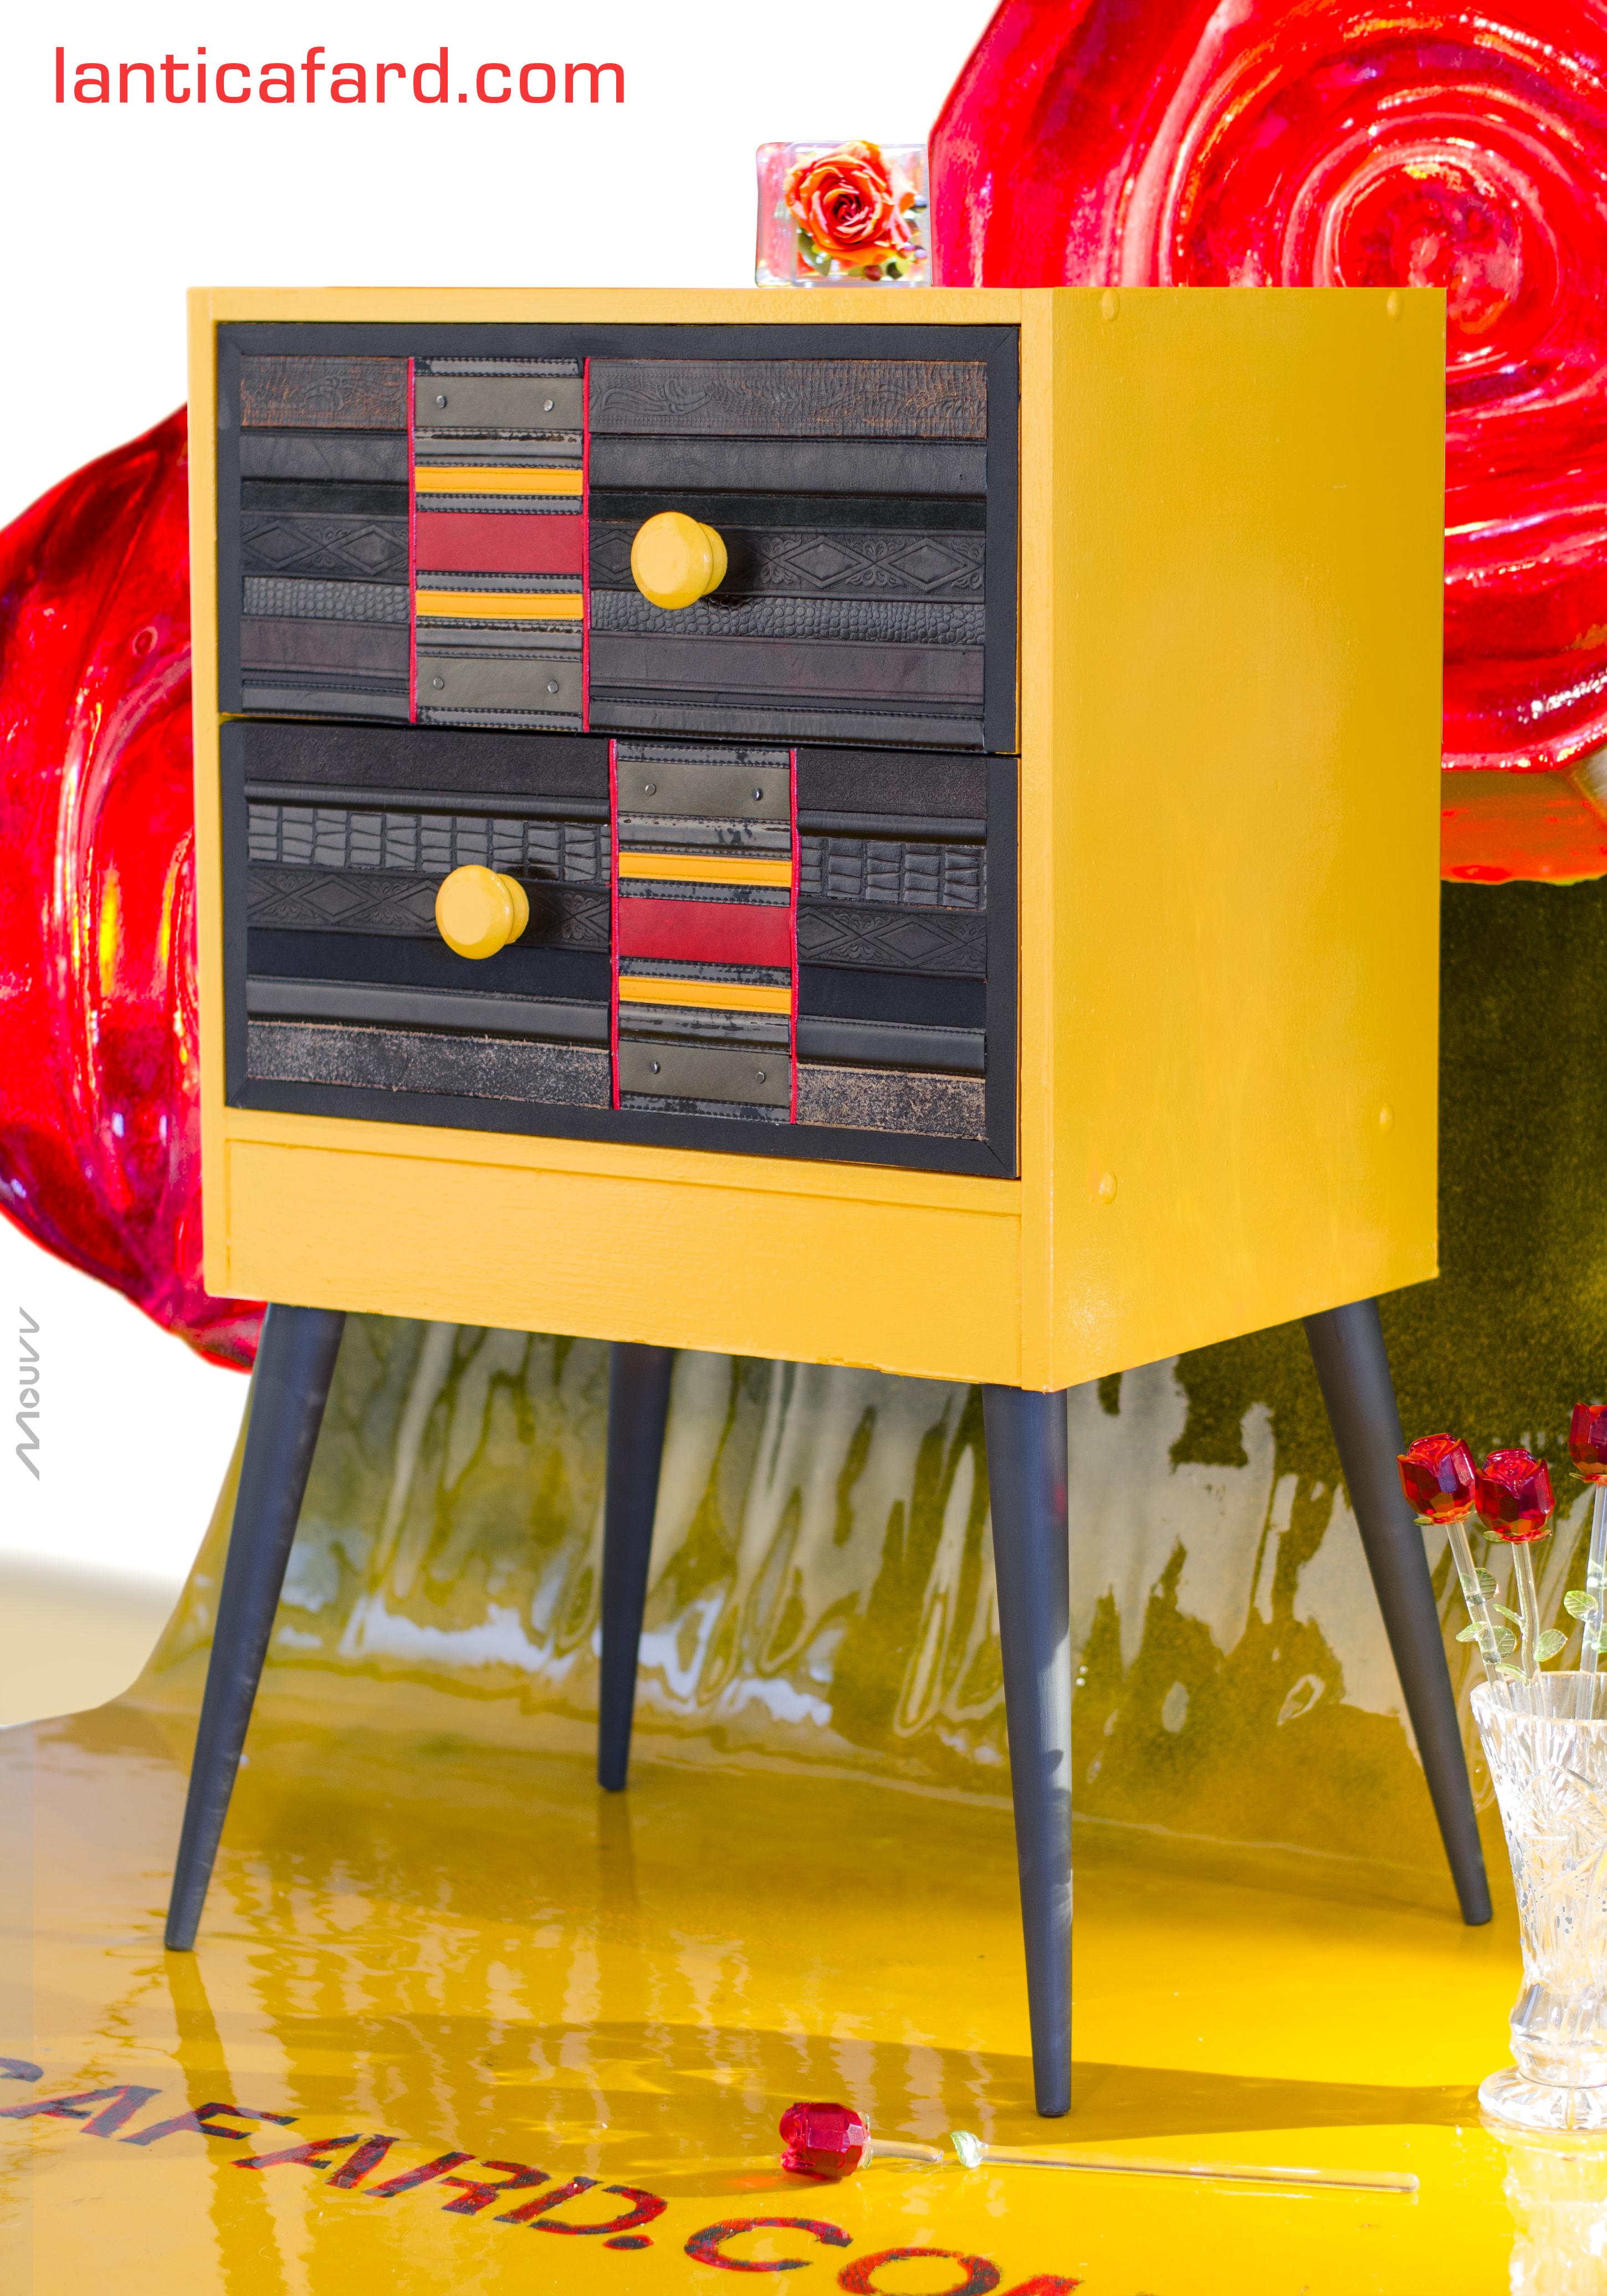 lanticafard_stephane_leblanc_meuble